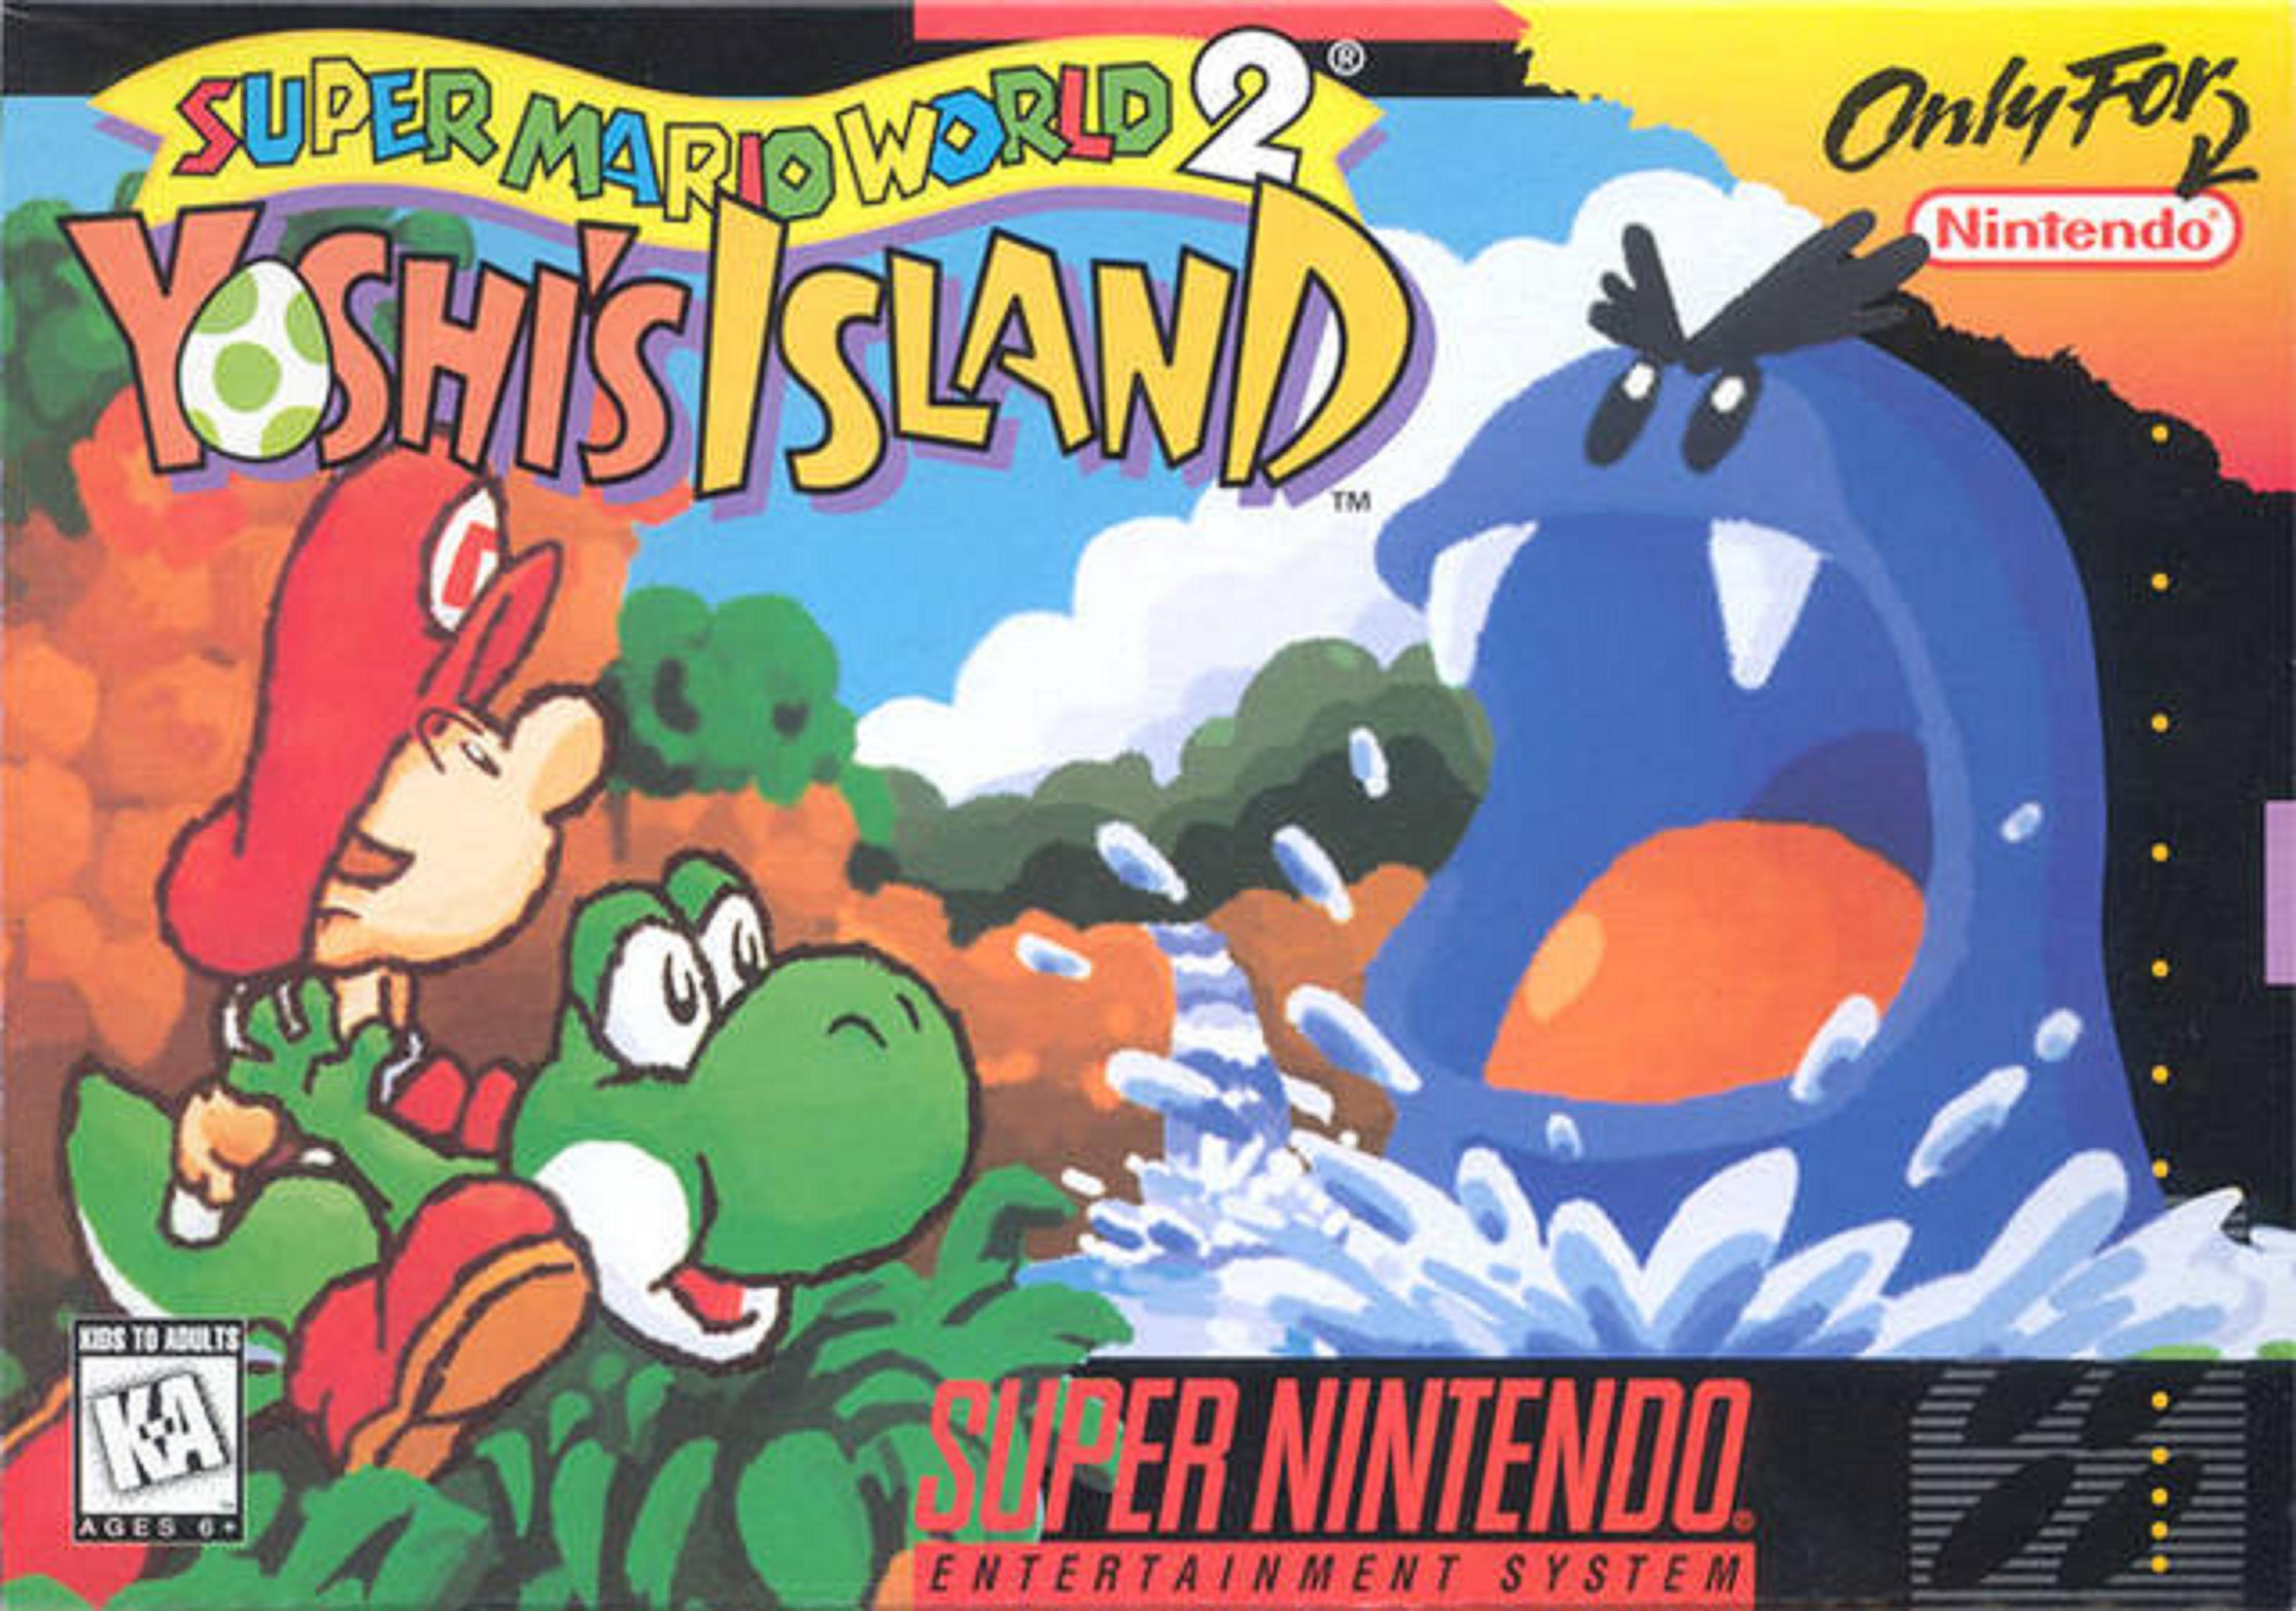 yoshis island original sound version.html